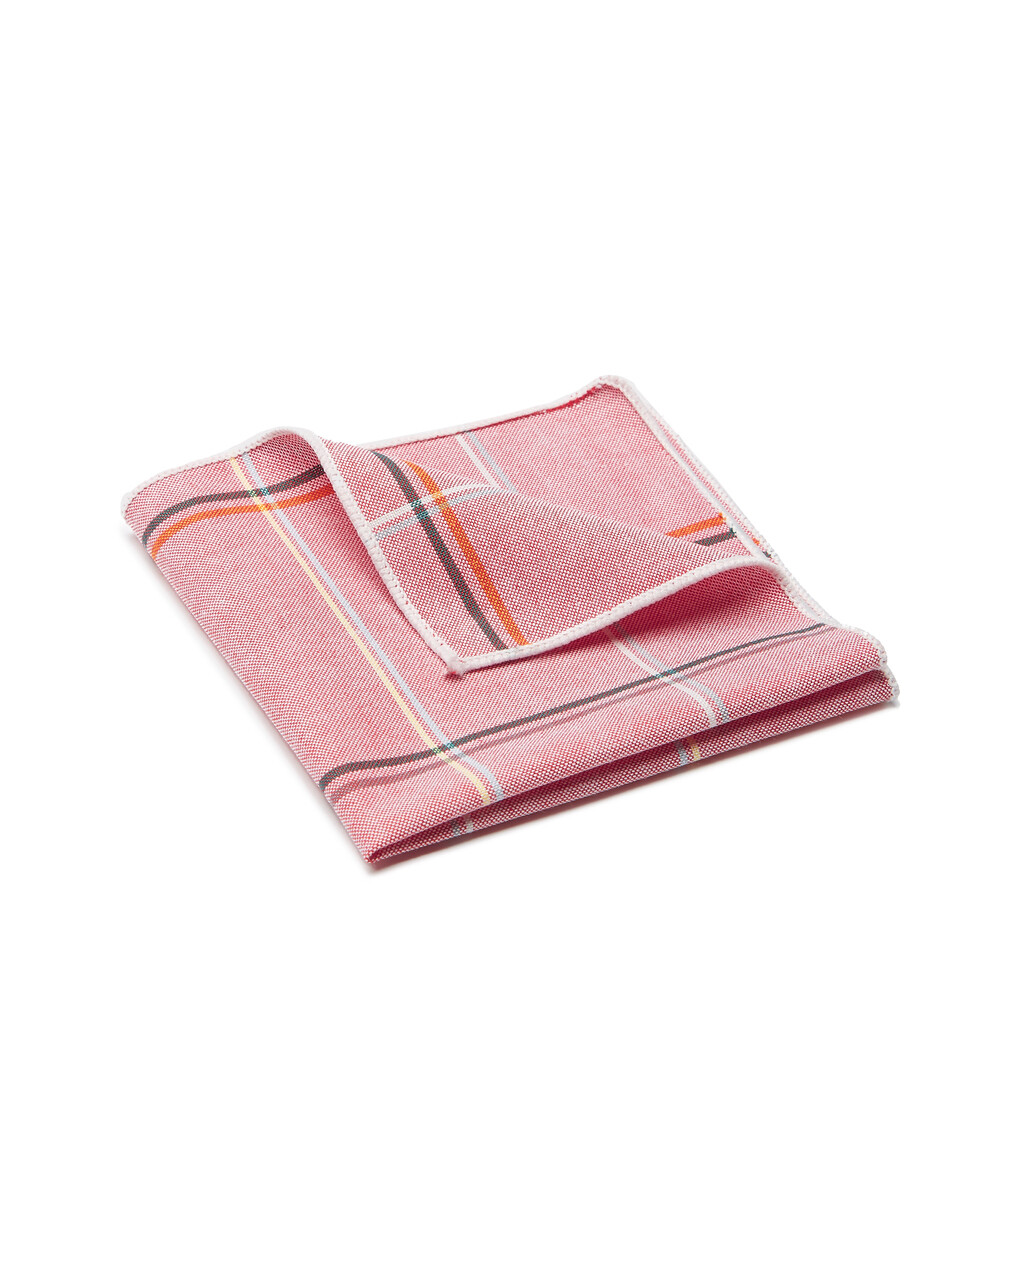 Pocket Square, Plaid, Pink